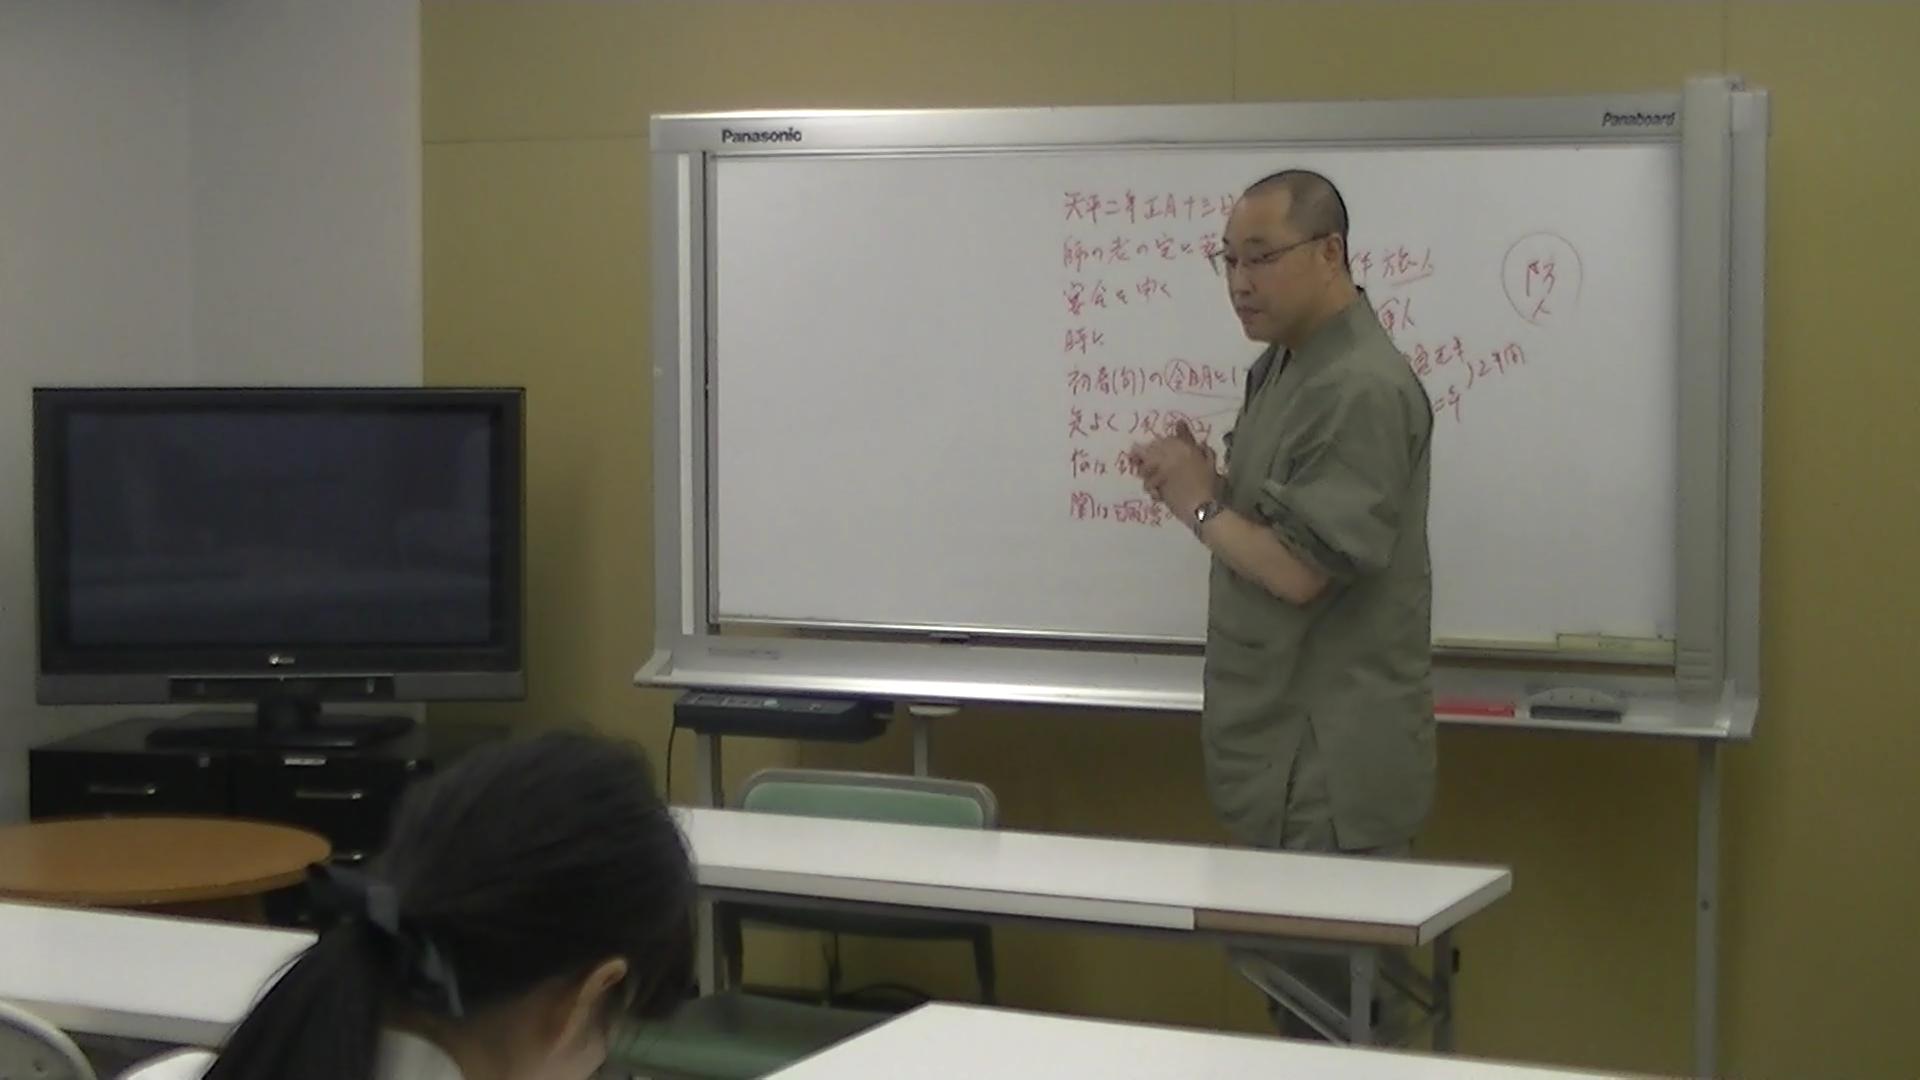 00286.MTS 003027691 - 釈正輪老師講話会開催